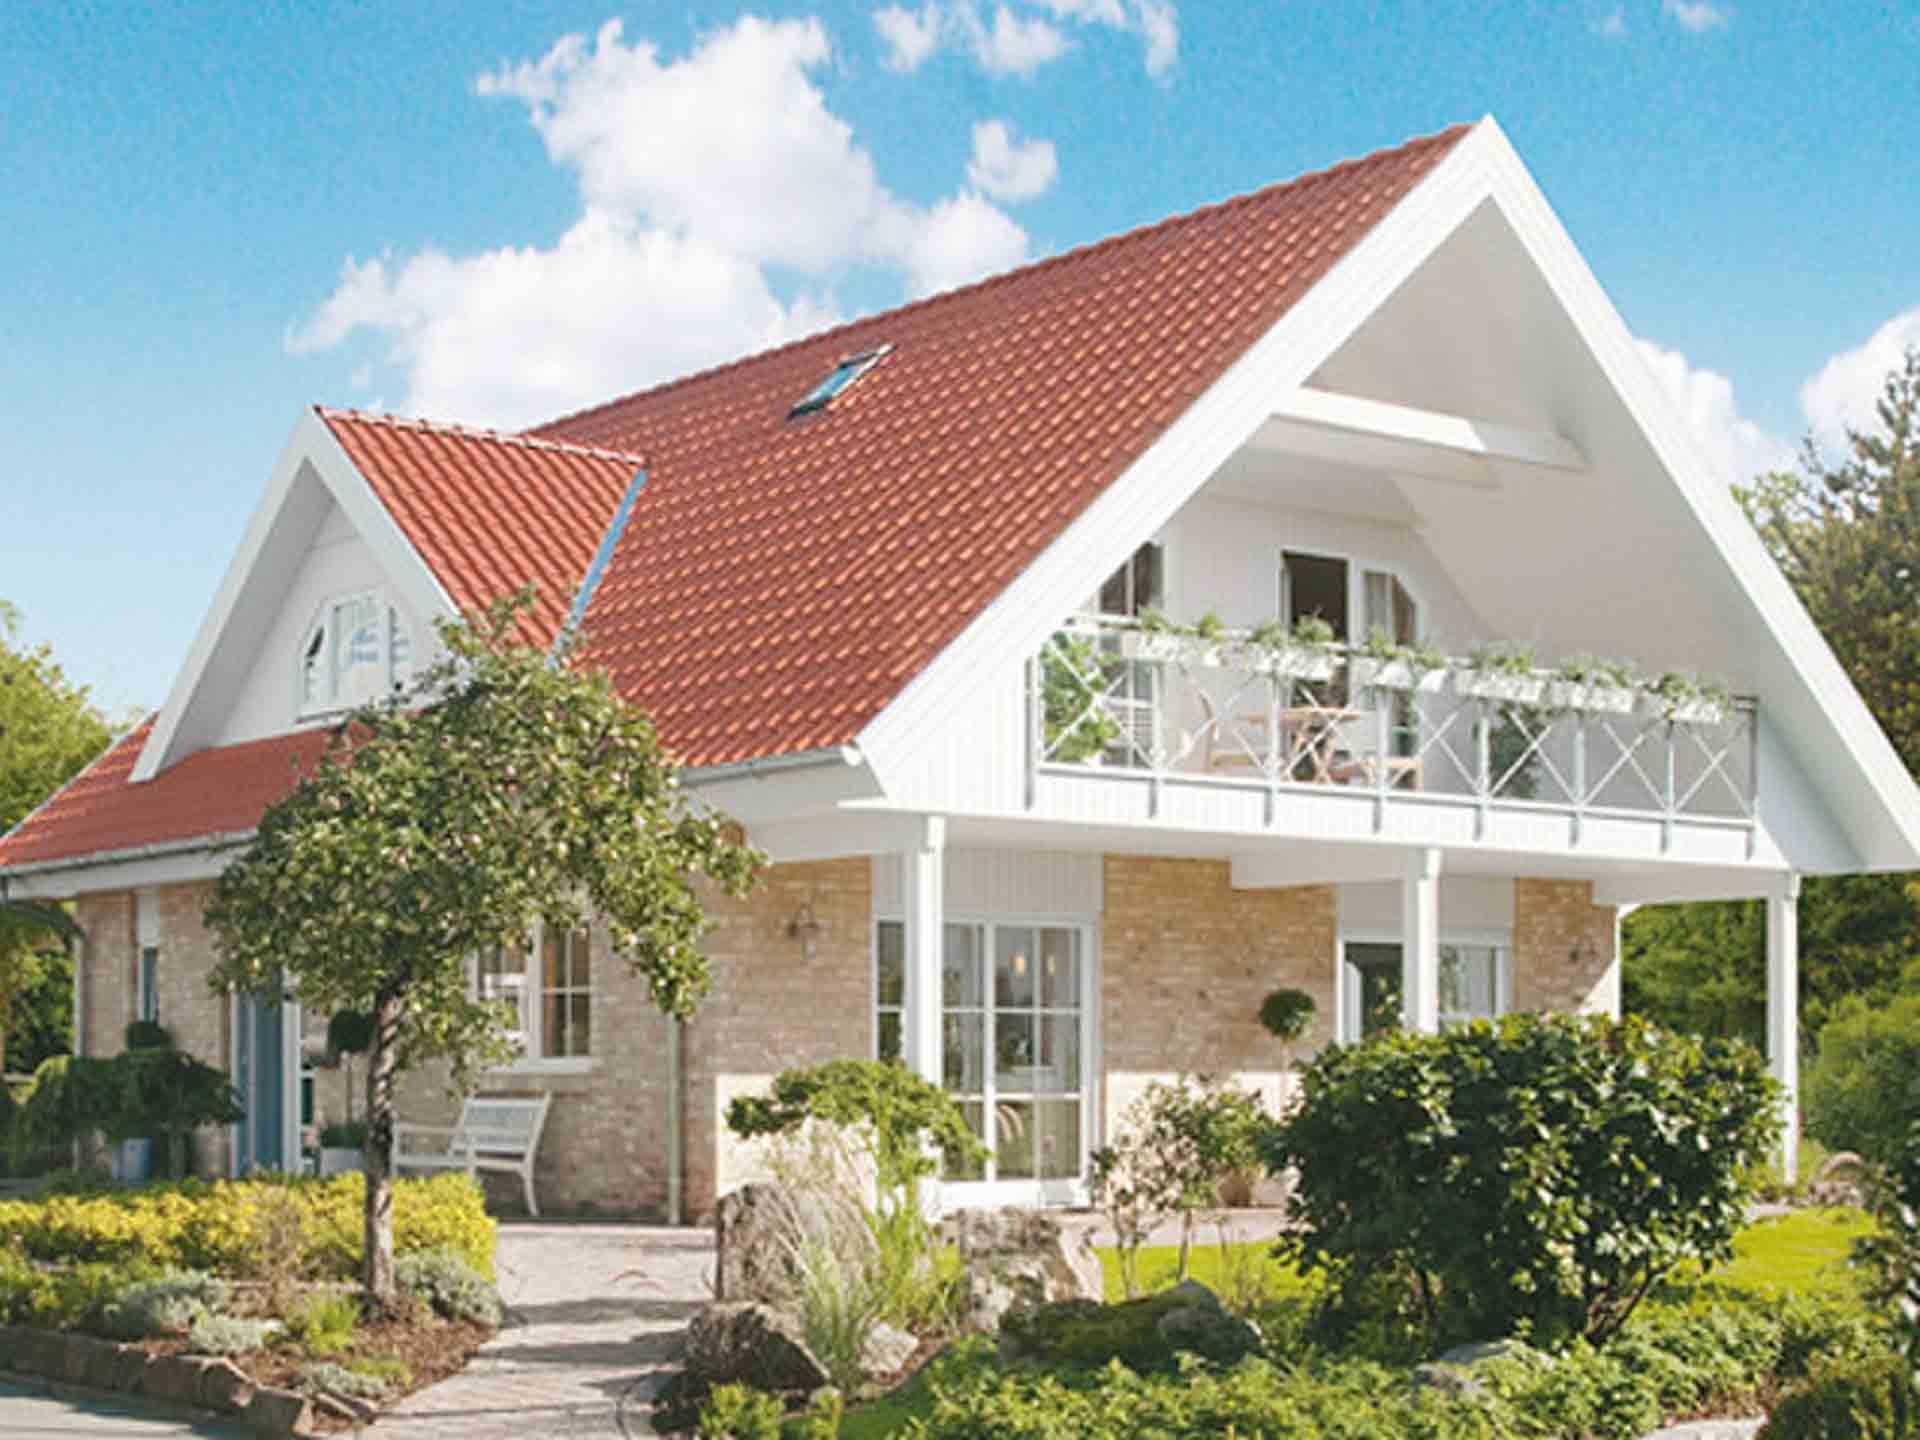 1Liter-Haus Stockholm - Danhaus Musterhaus.net